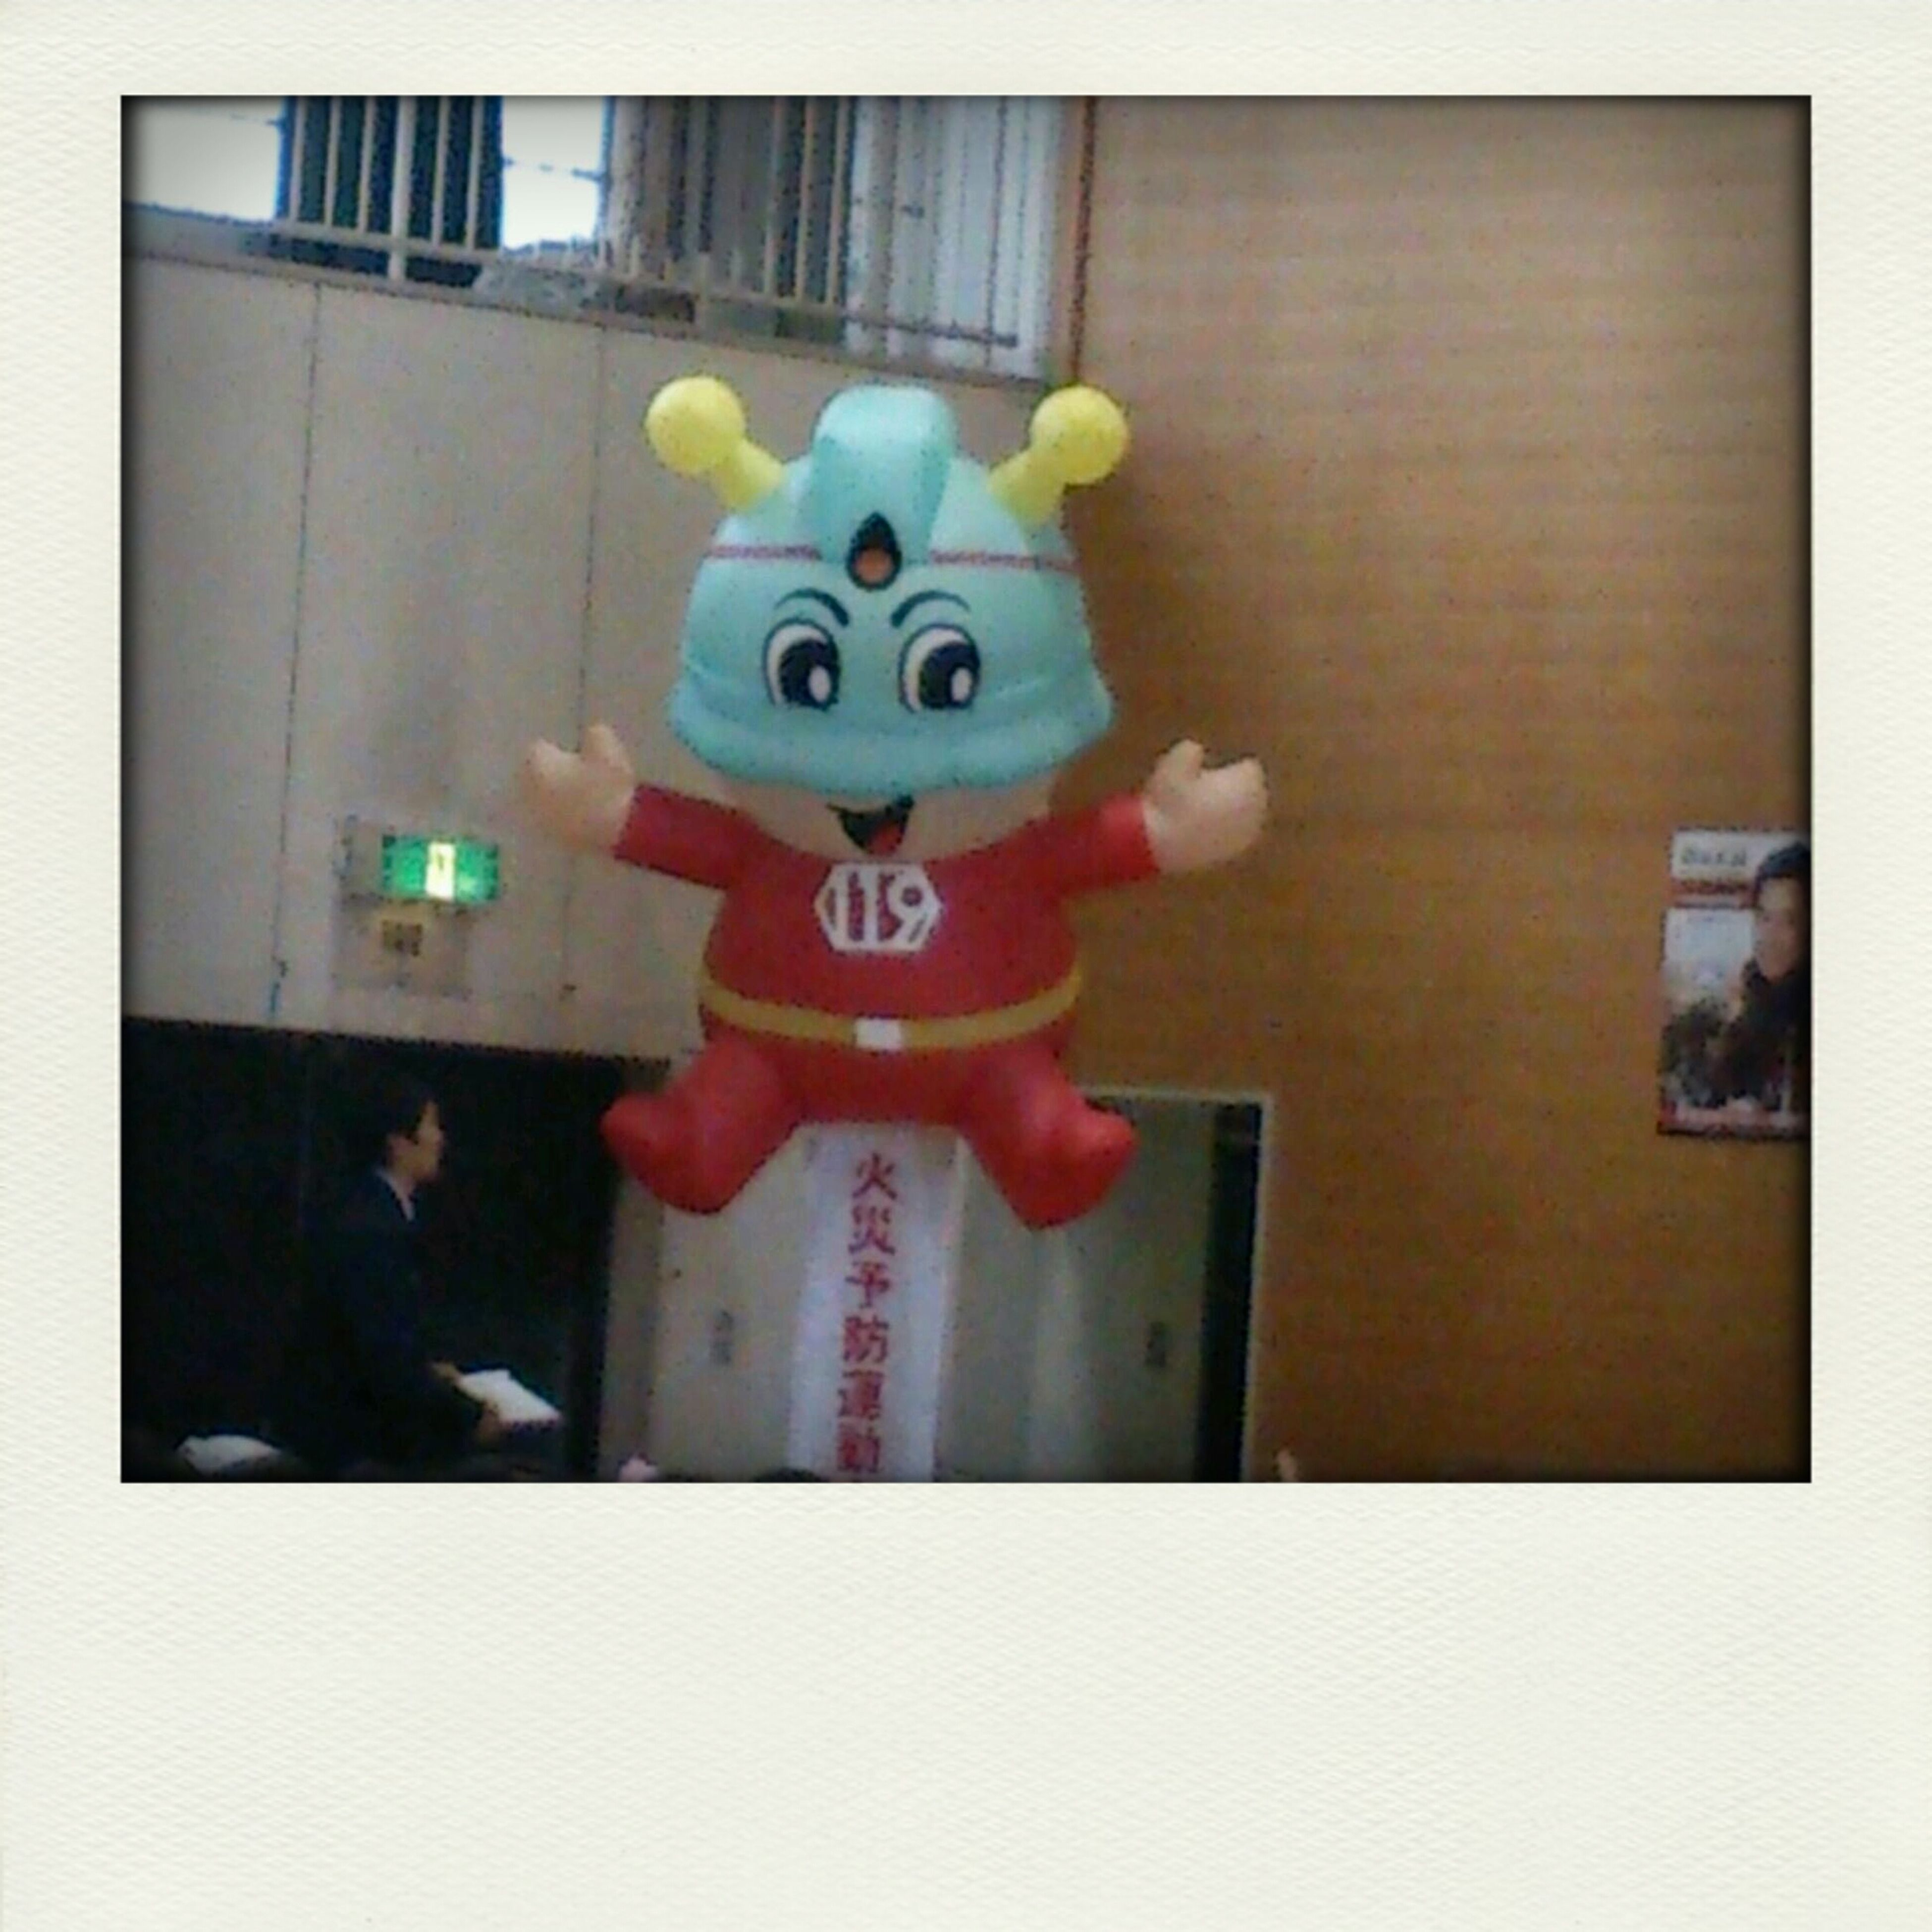 TFD´s Character Kyuta! 娘が消防車写生会で優秀賞もらいました!今日はその表彰式。